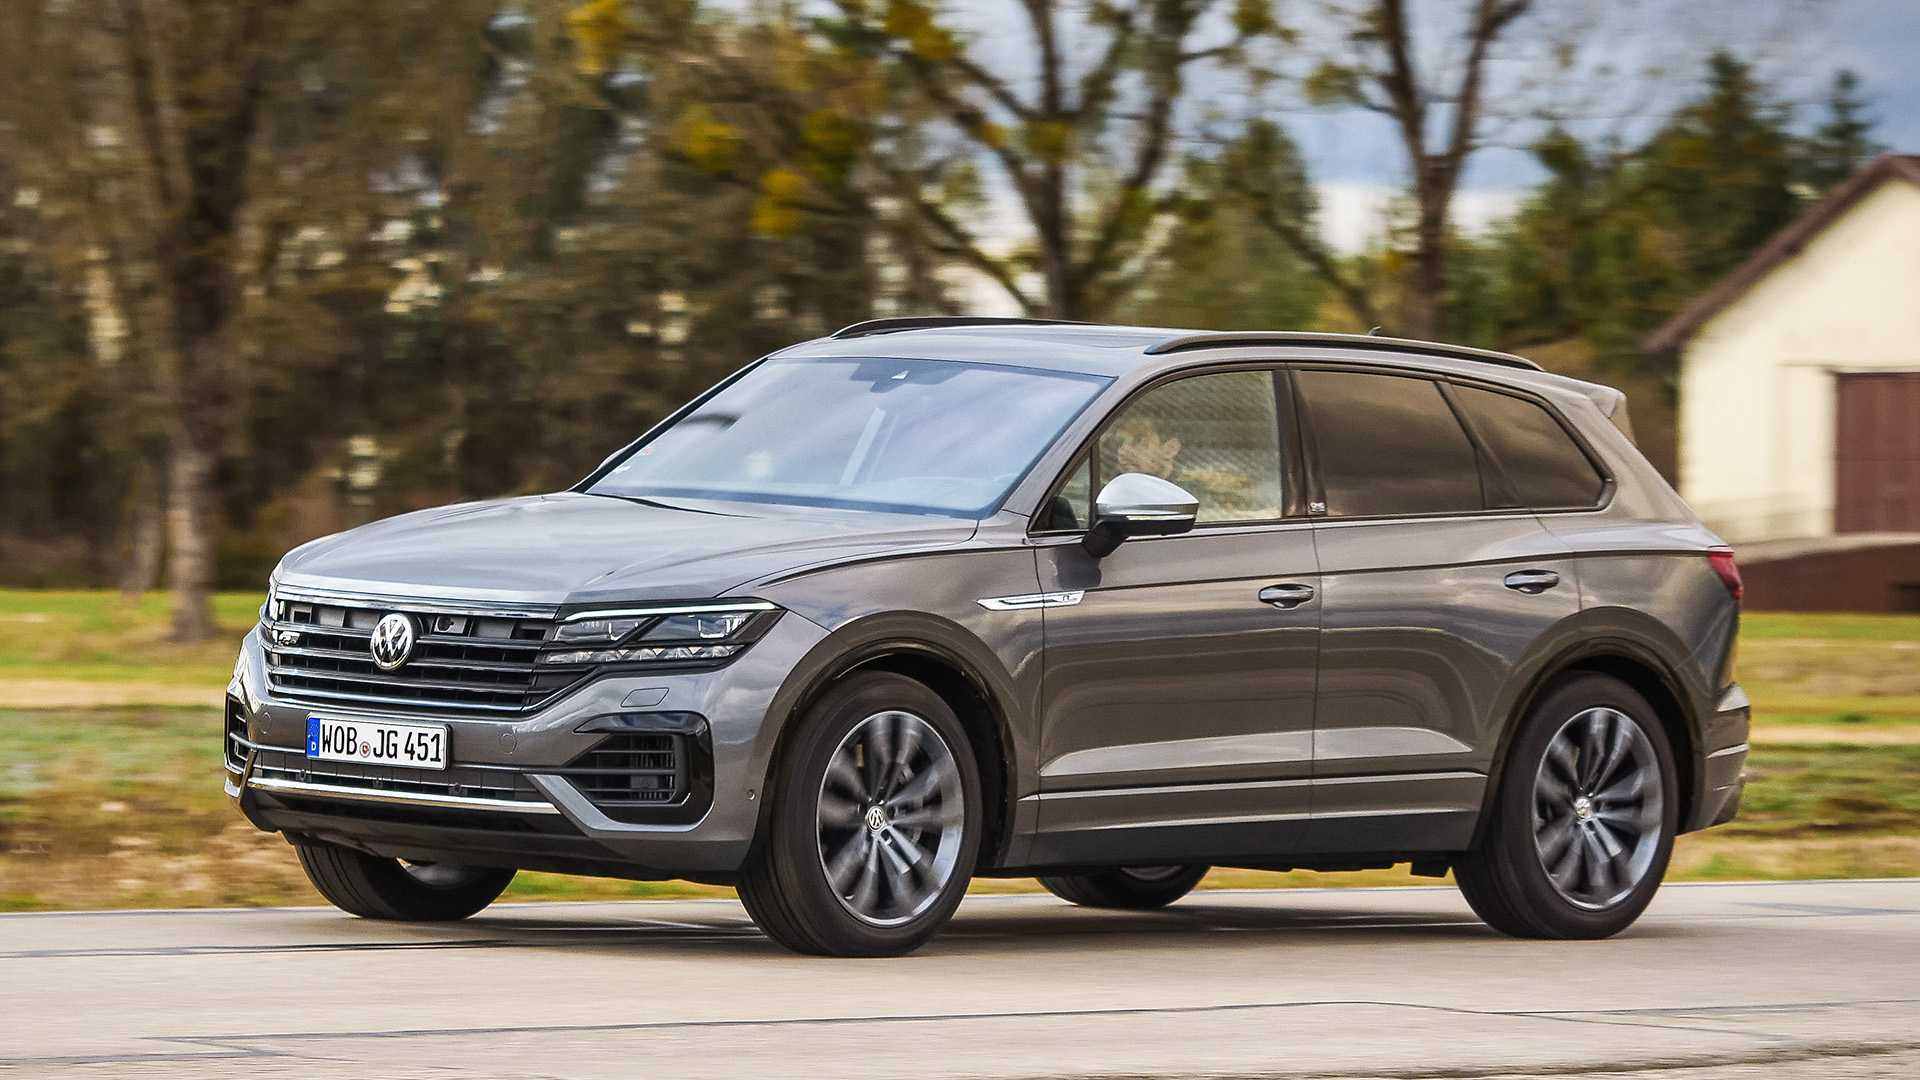 2020 Volkswagen Touareg Performance